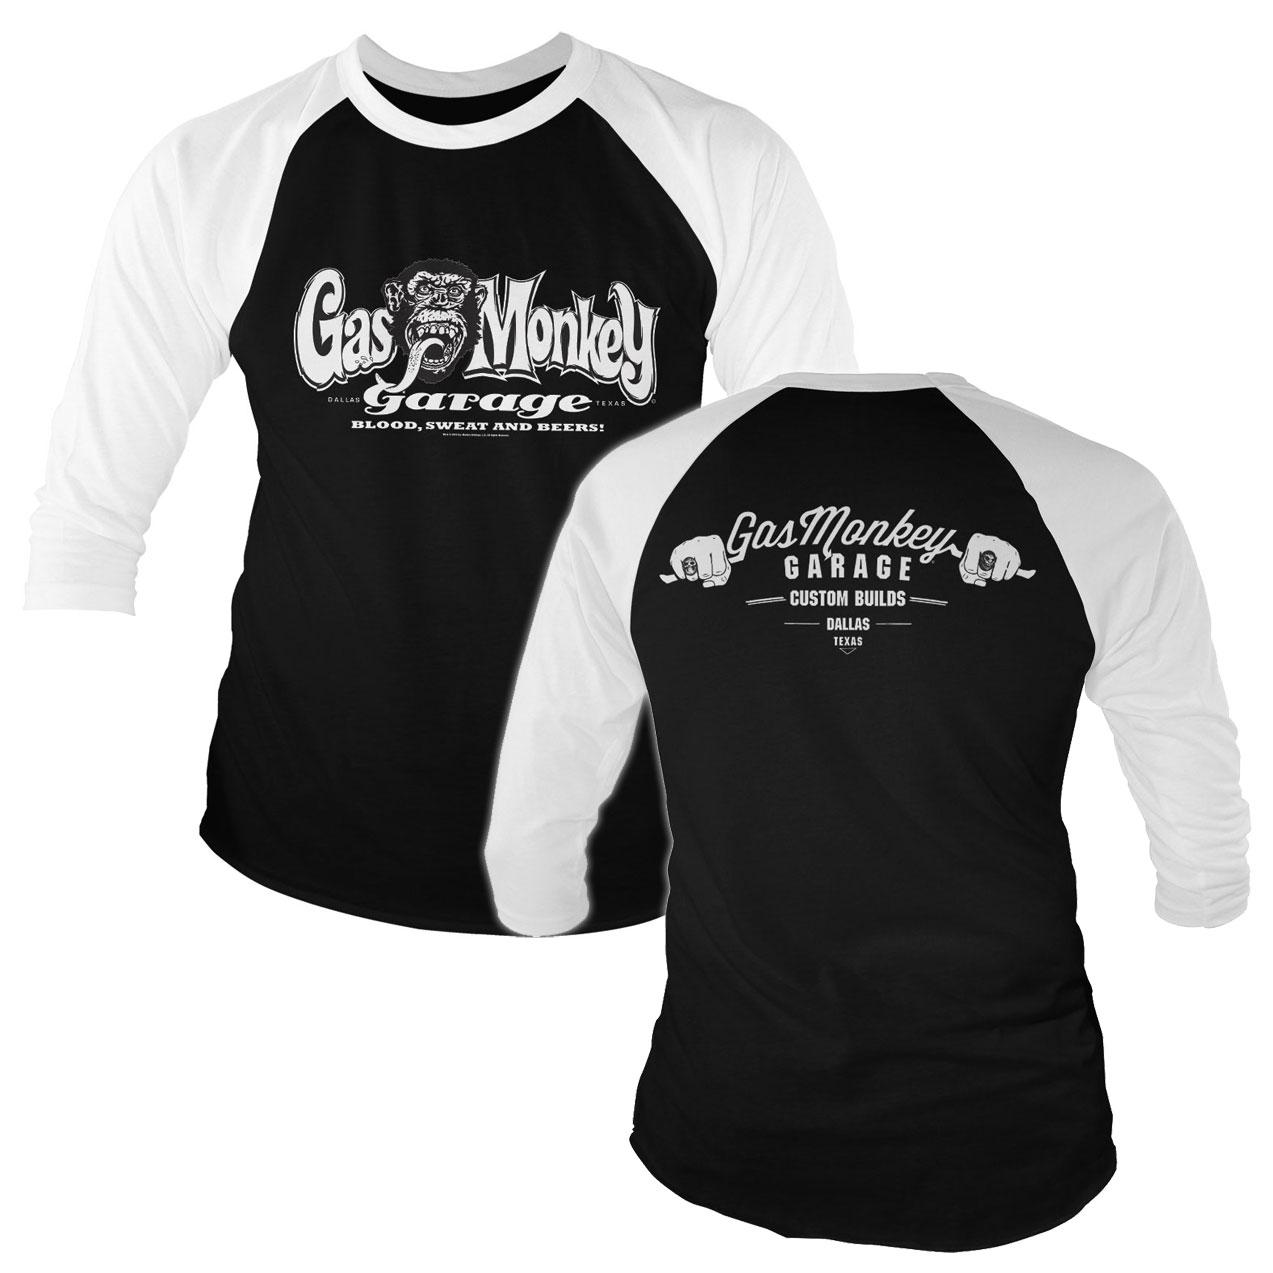 Triko 3/4 Gas Monkey Garage Bar Knuckles Baseball - černé-bílé, XL